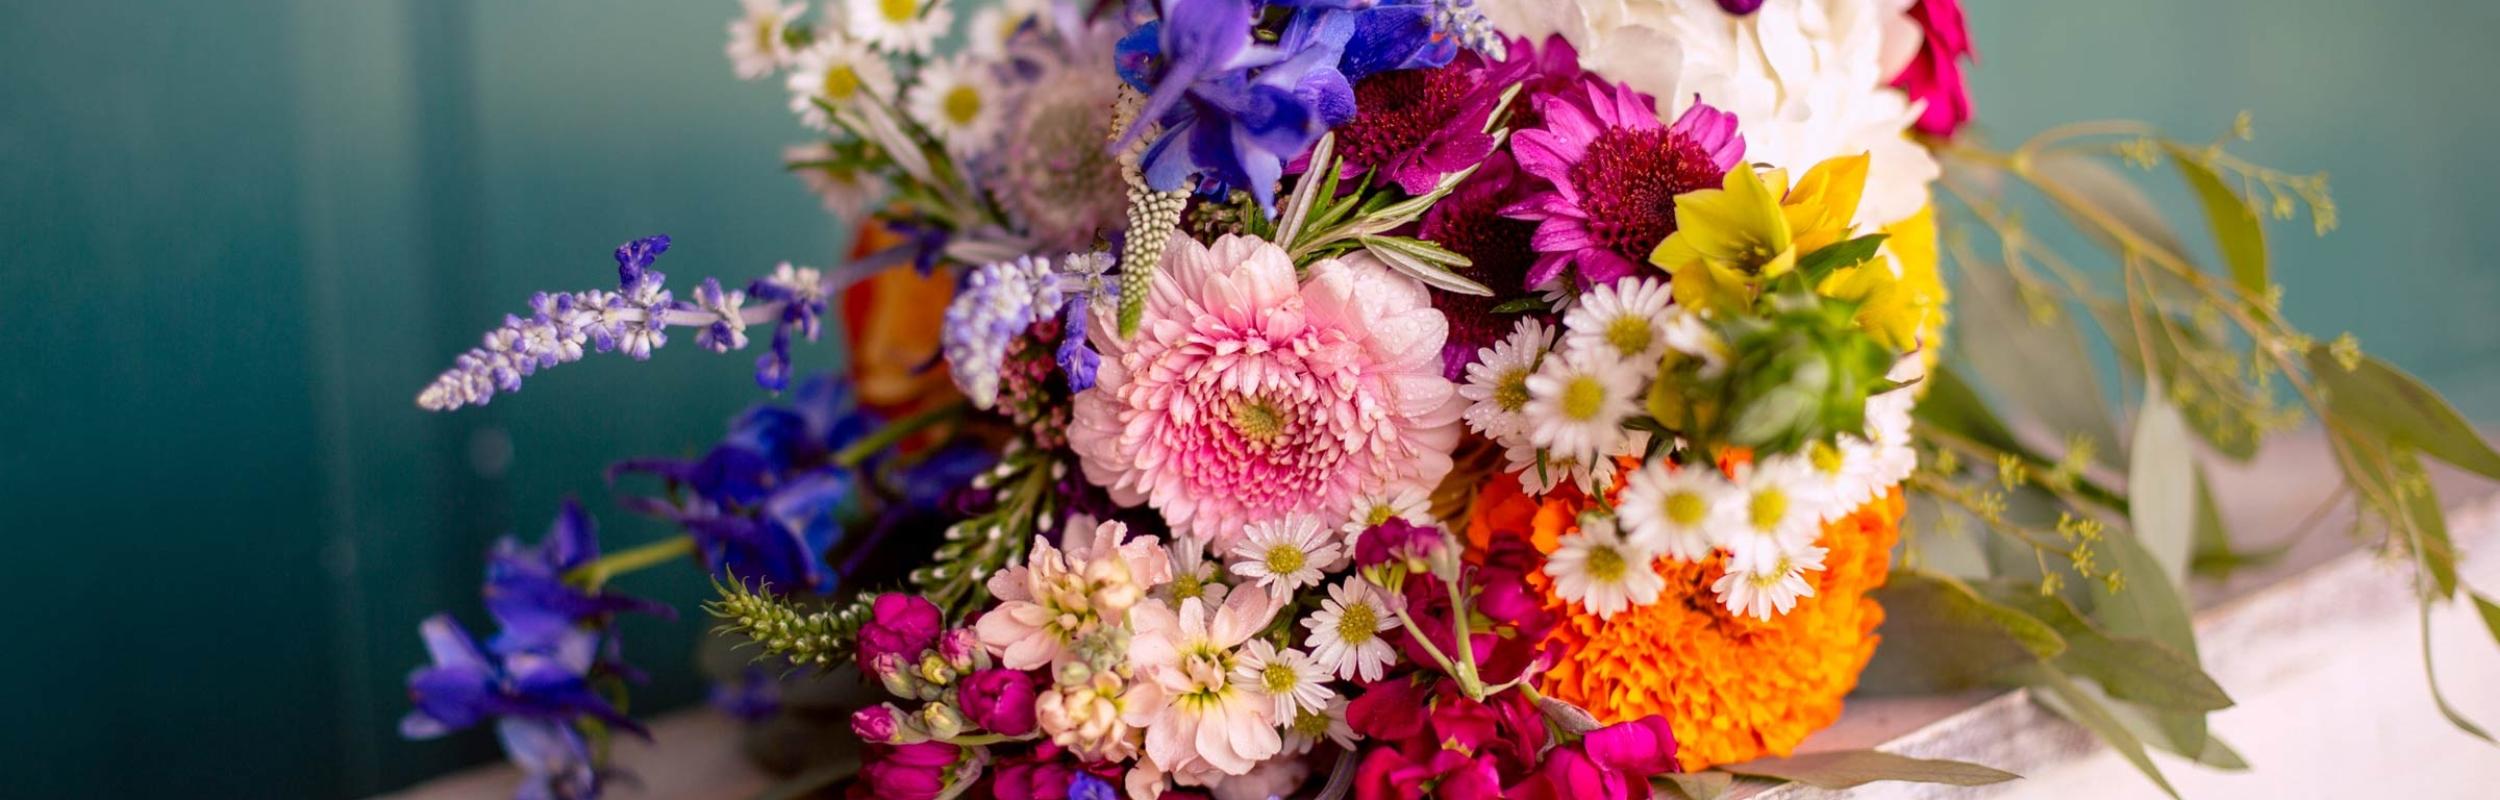 Bright-bridal-bouquet